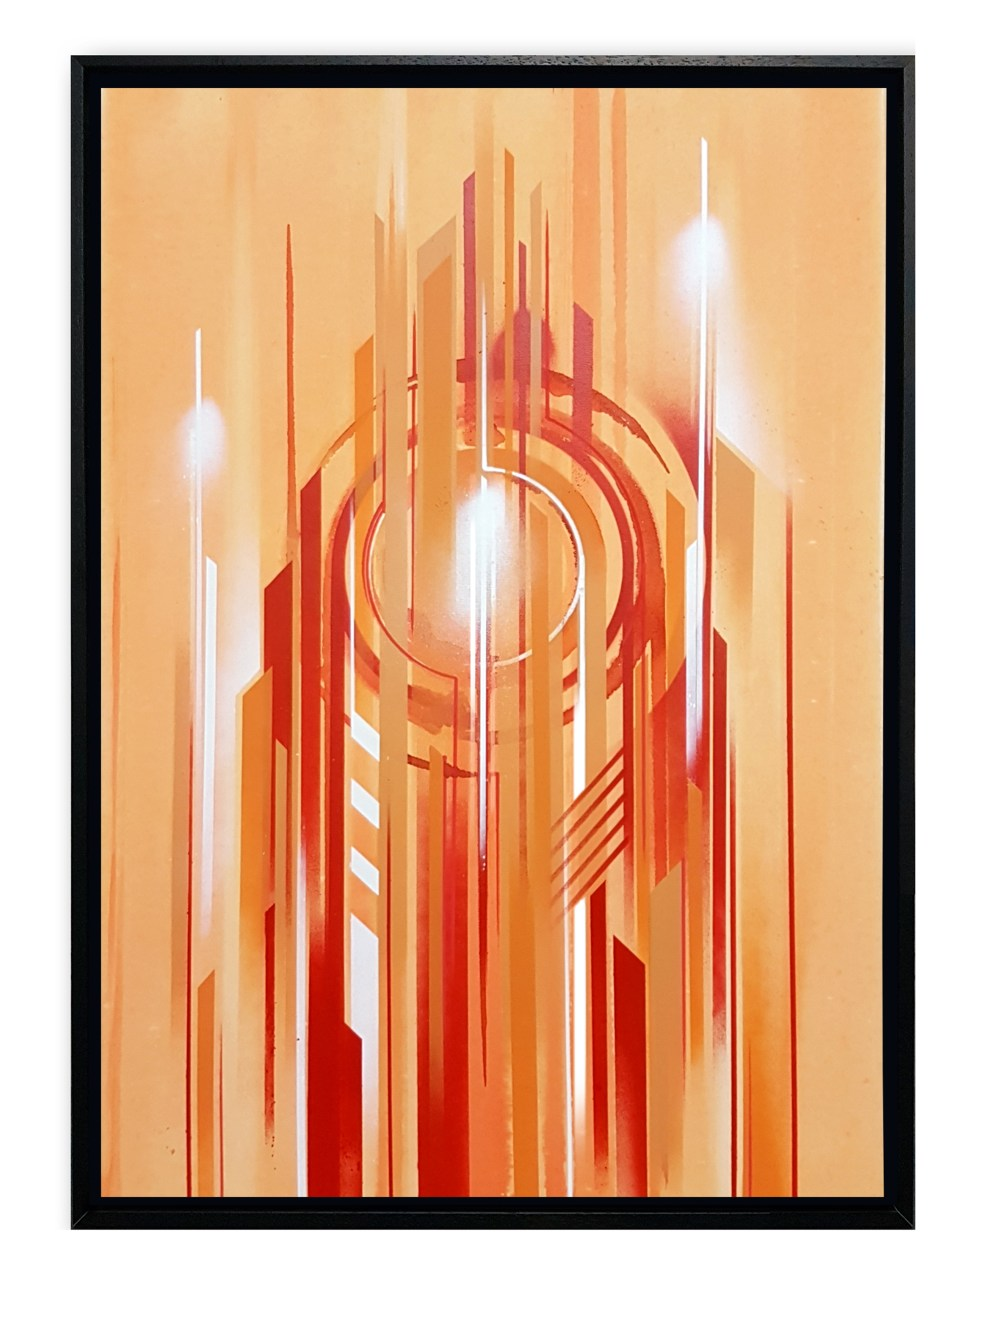 iazzu - interstellar orange Magaldi 50x70 2017